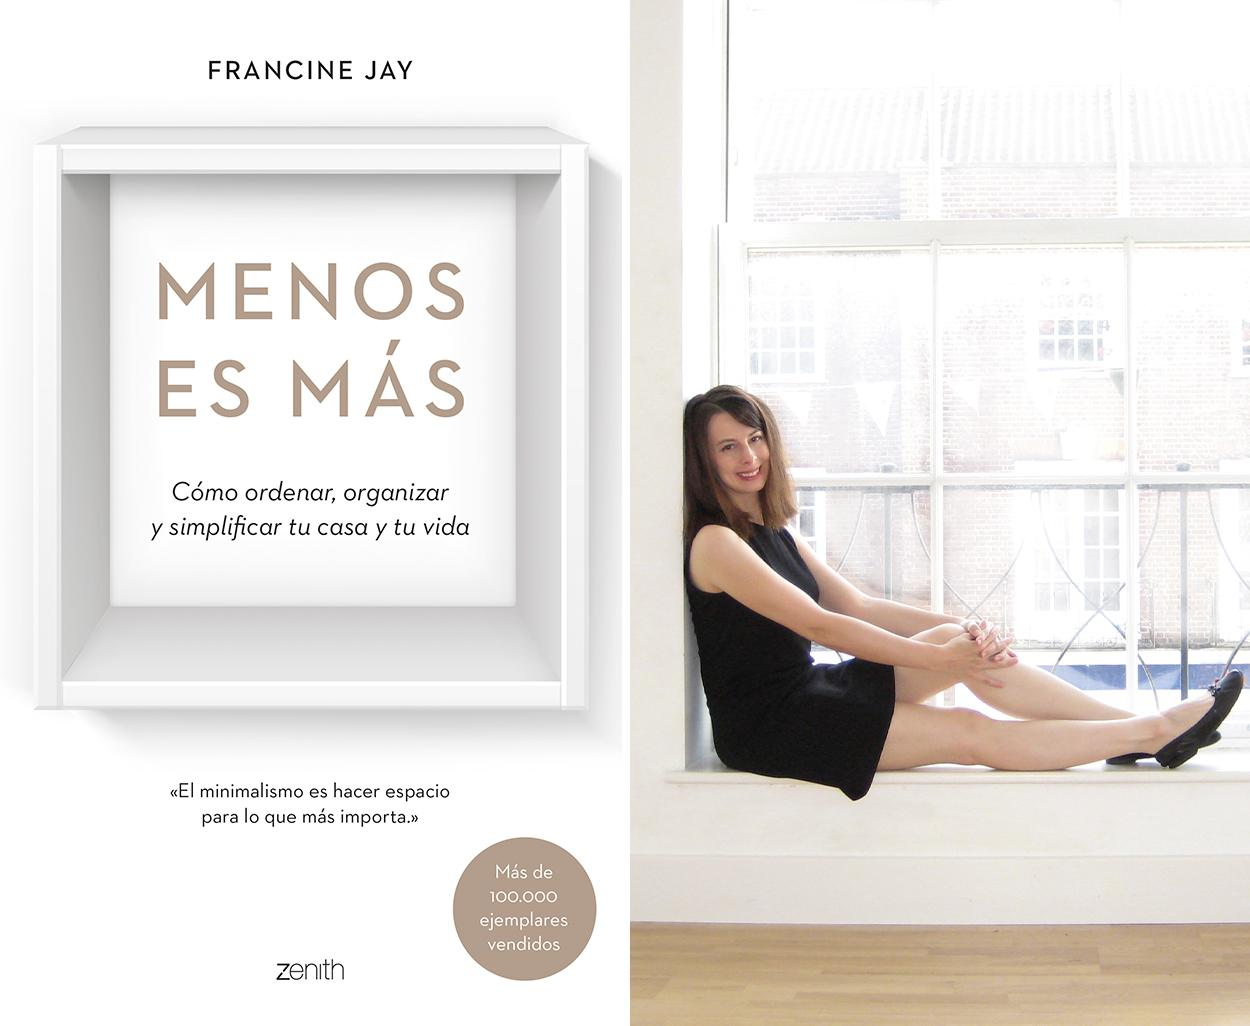 Francine Jay